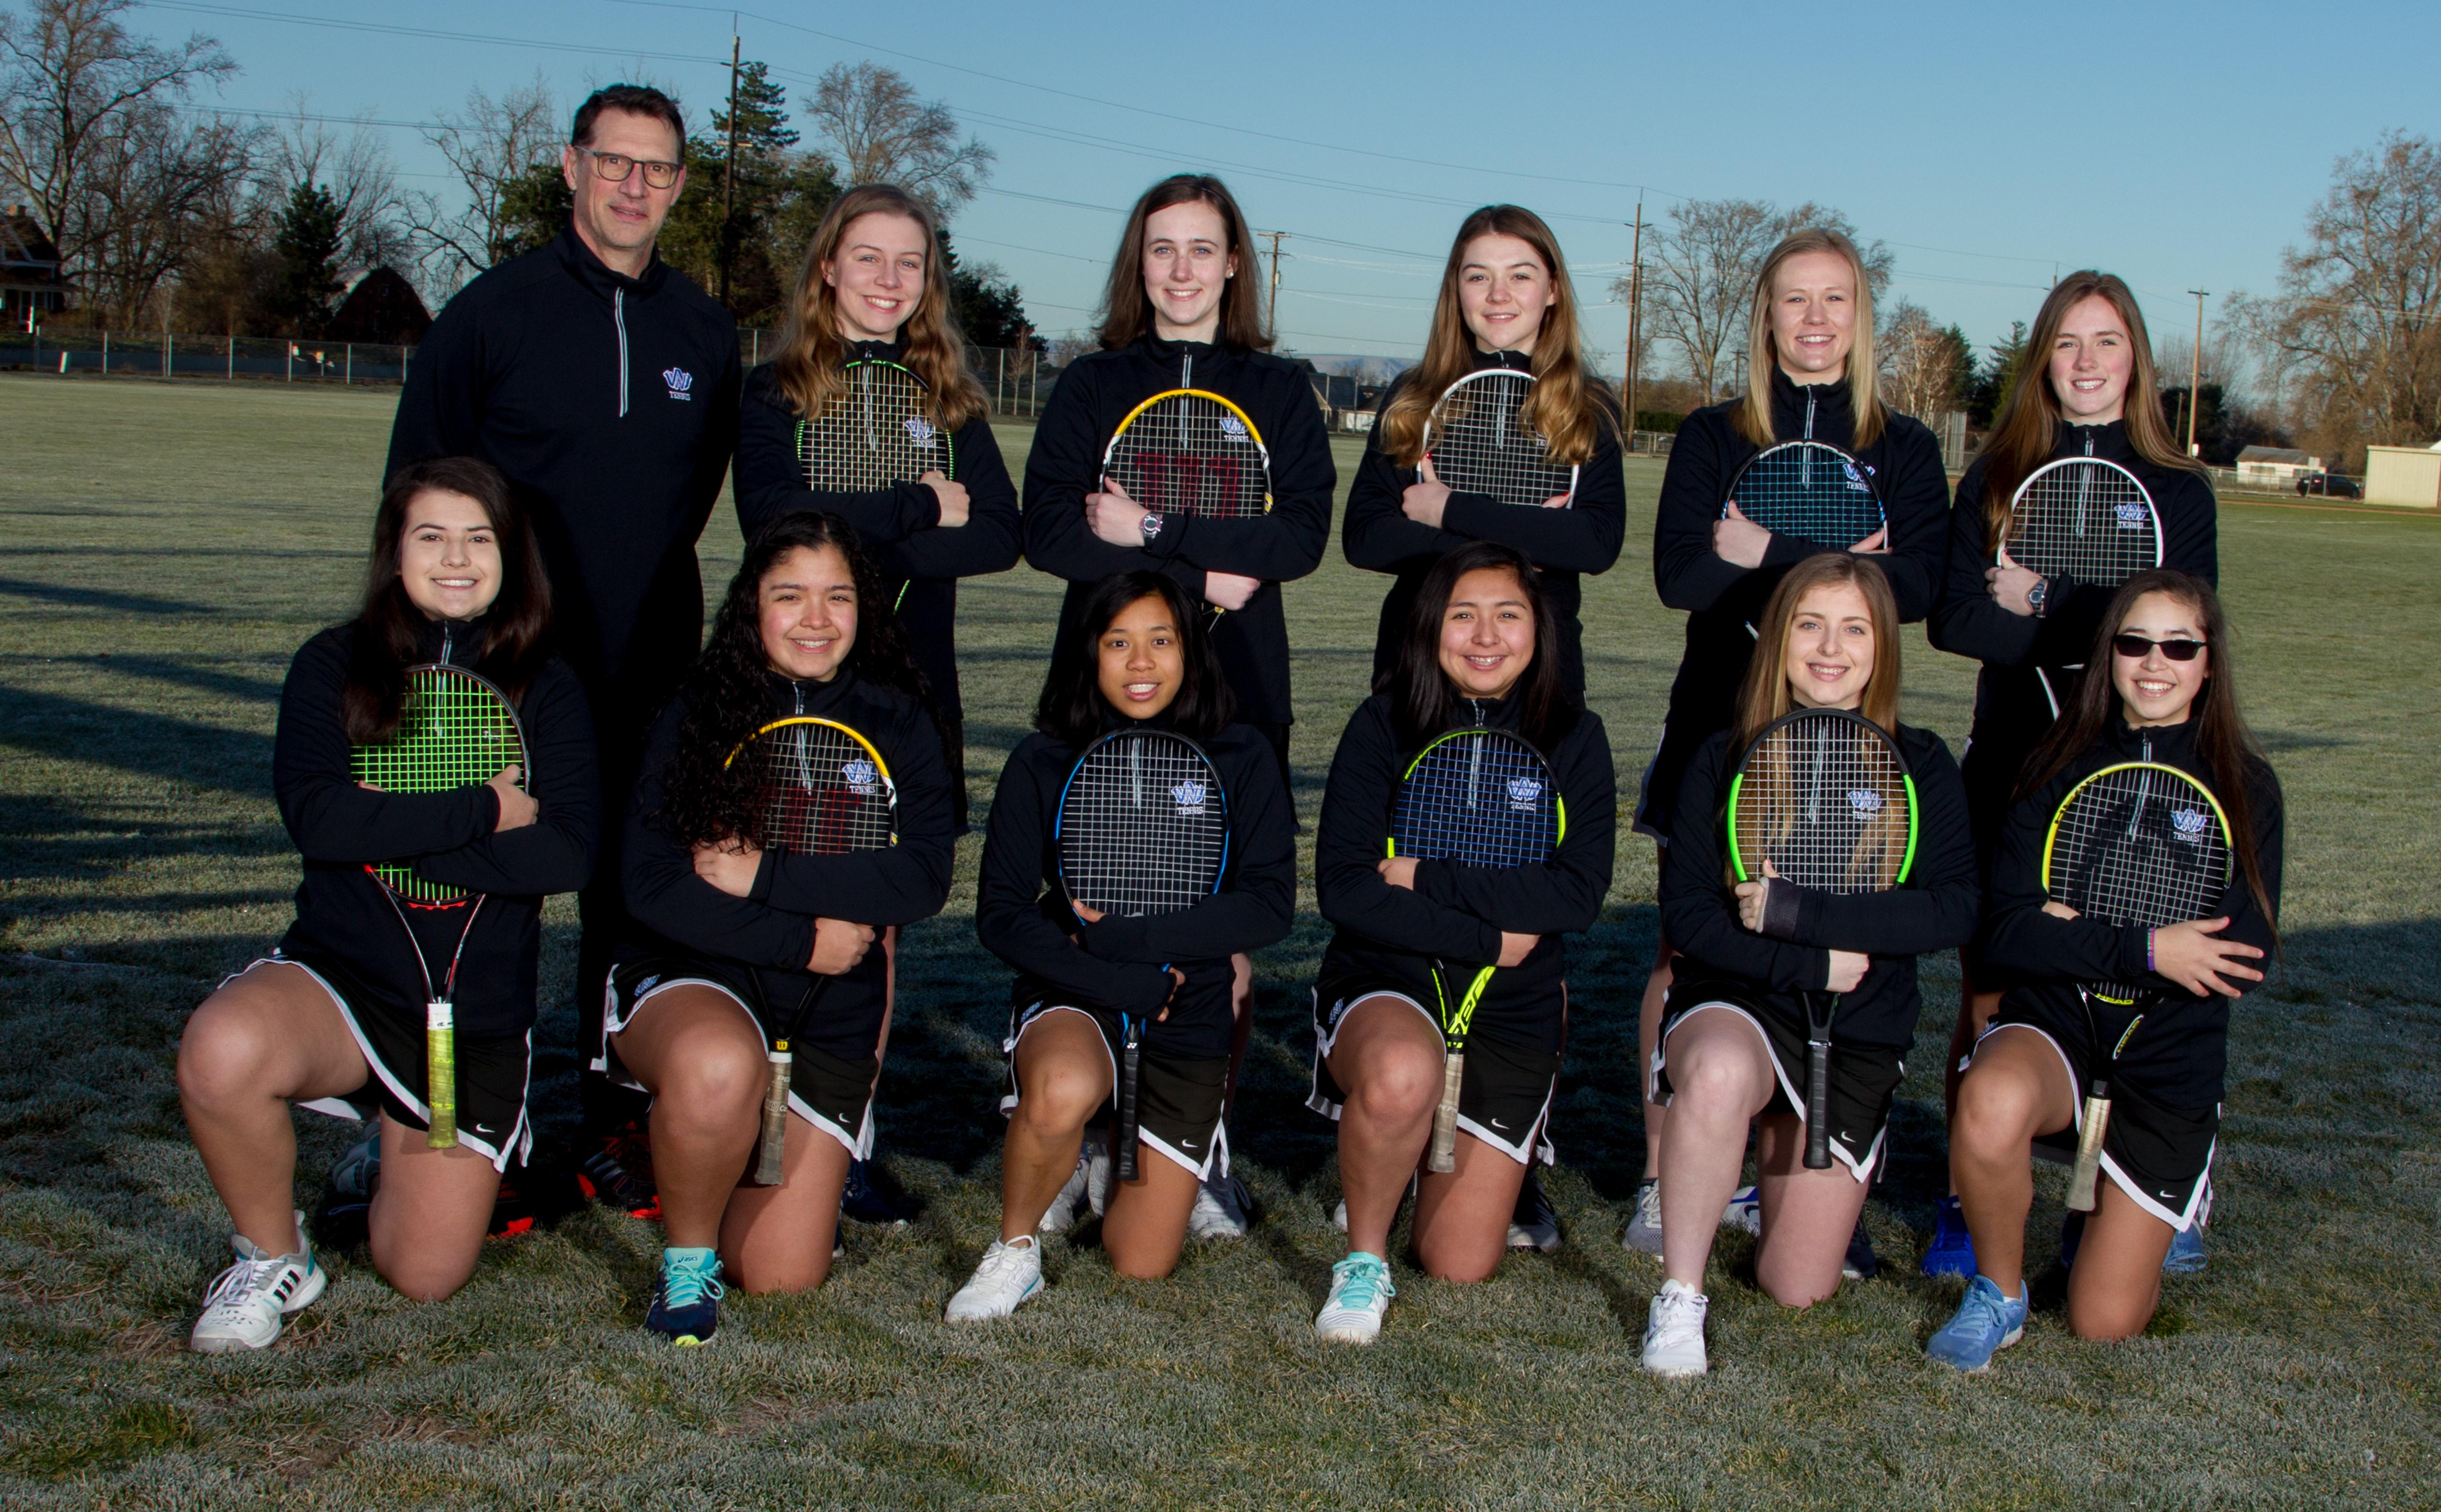 images/athletics/Tennis/2018_Girls_Tennis_Varsity_.jpg